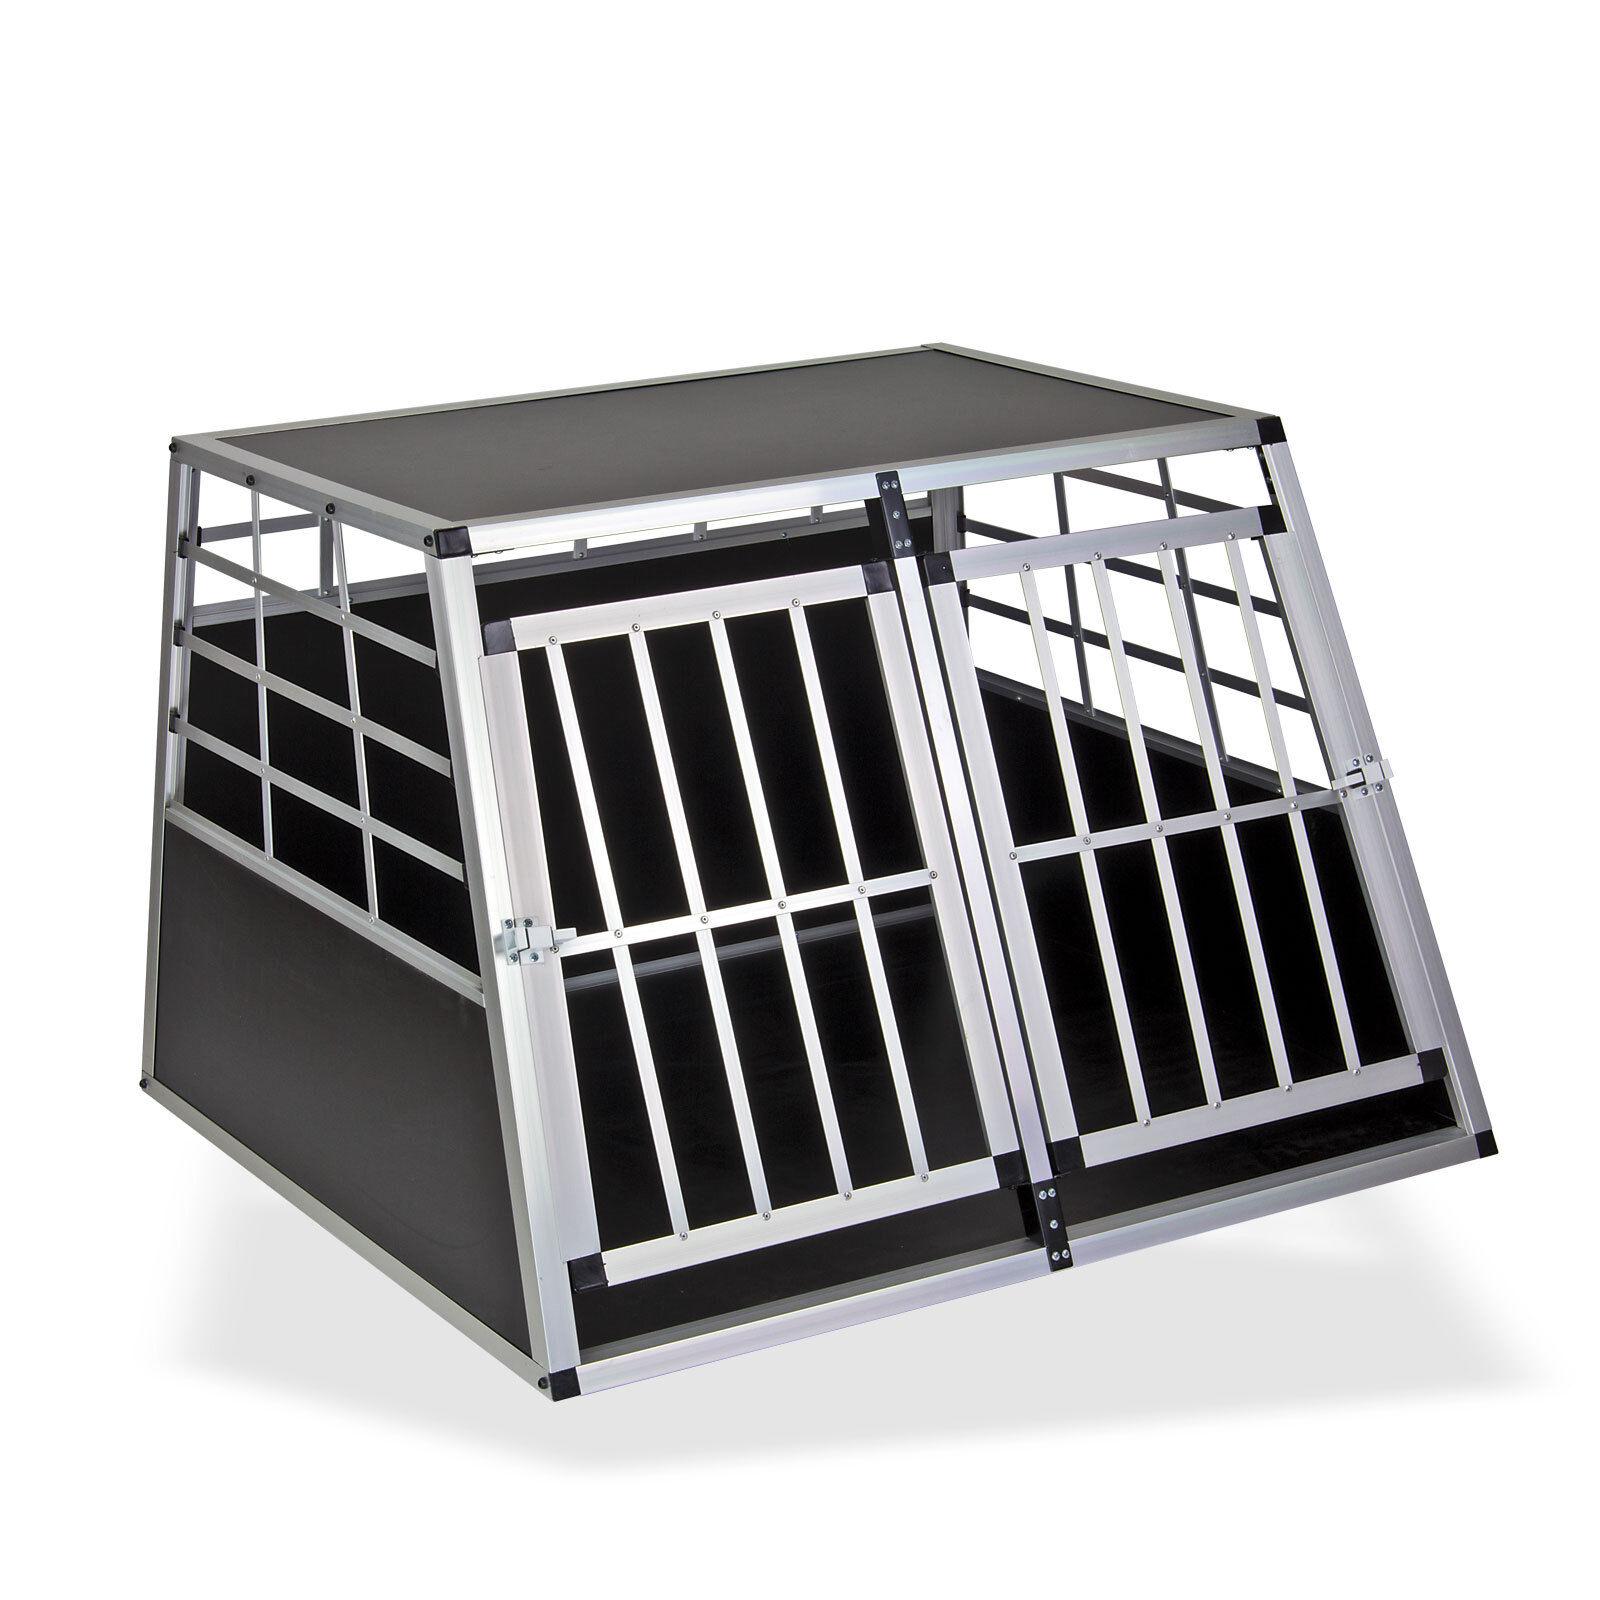 Hunde-Transport-Auto-Box Hund Hund Hund Reisebox XL Aluminium Balu 924339 51f24b